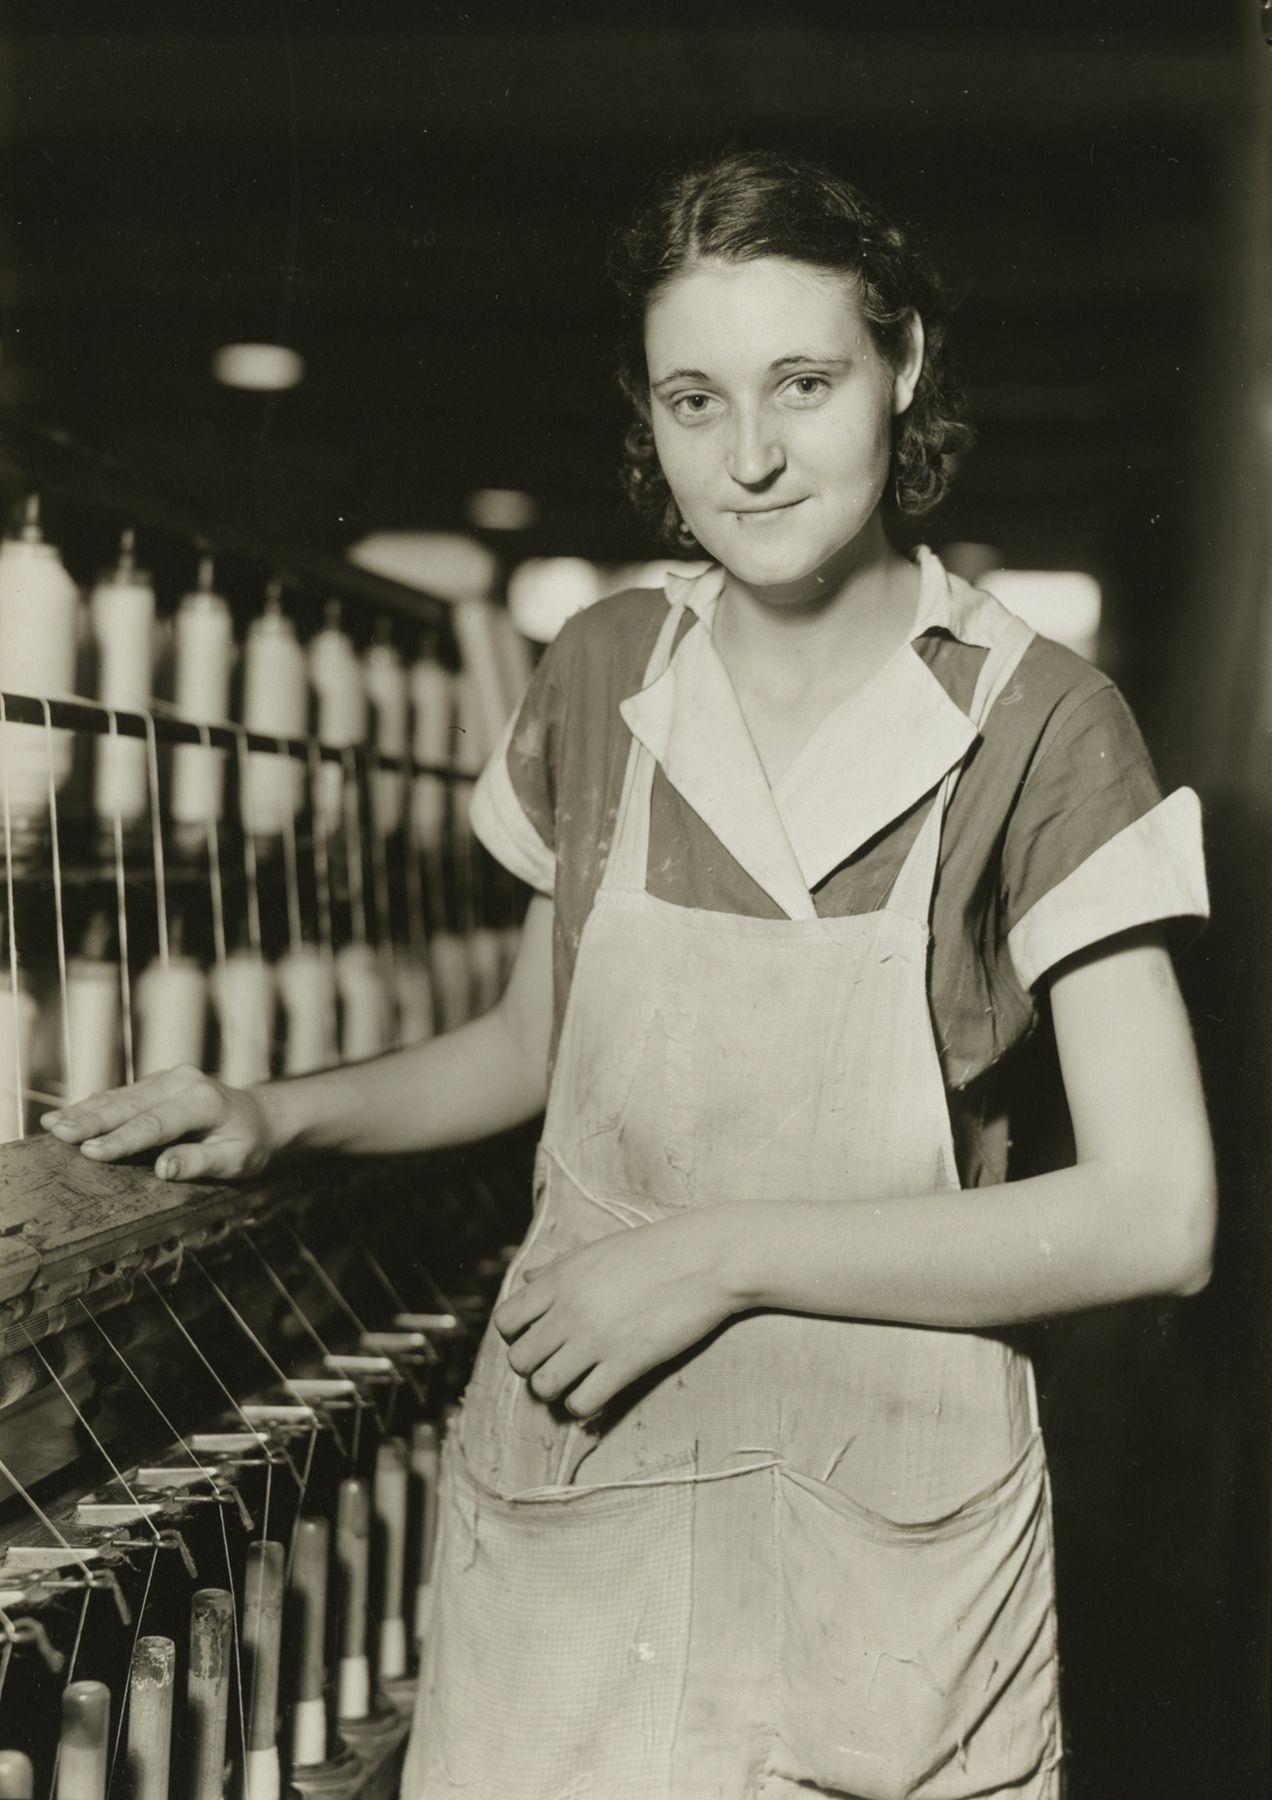 Picket Yarn Mill, High Point, North Carolina, 1936-37